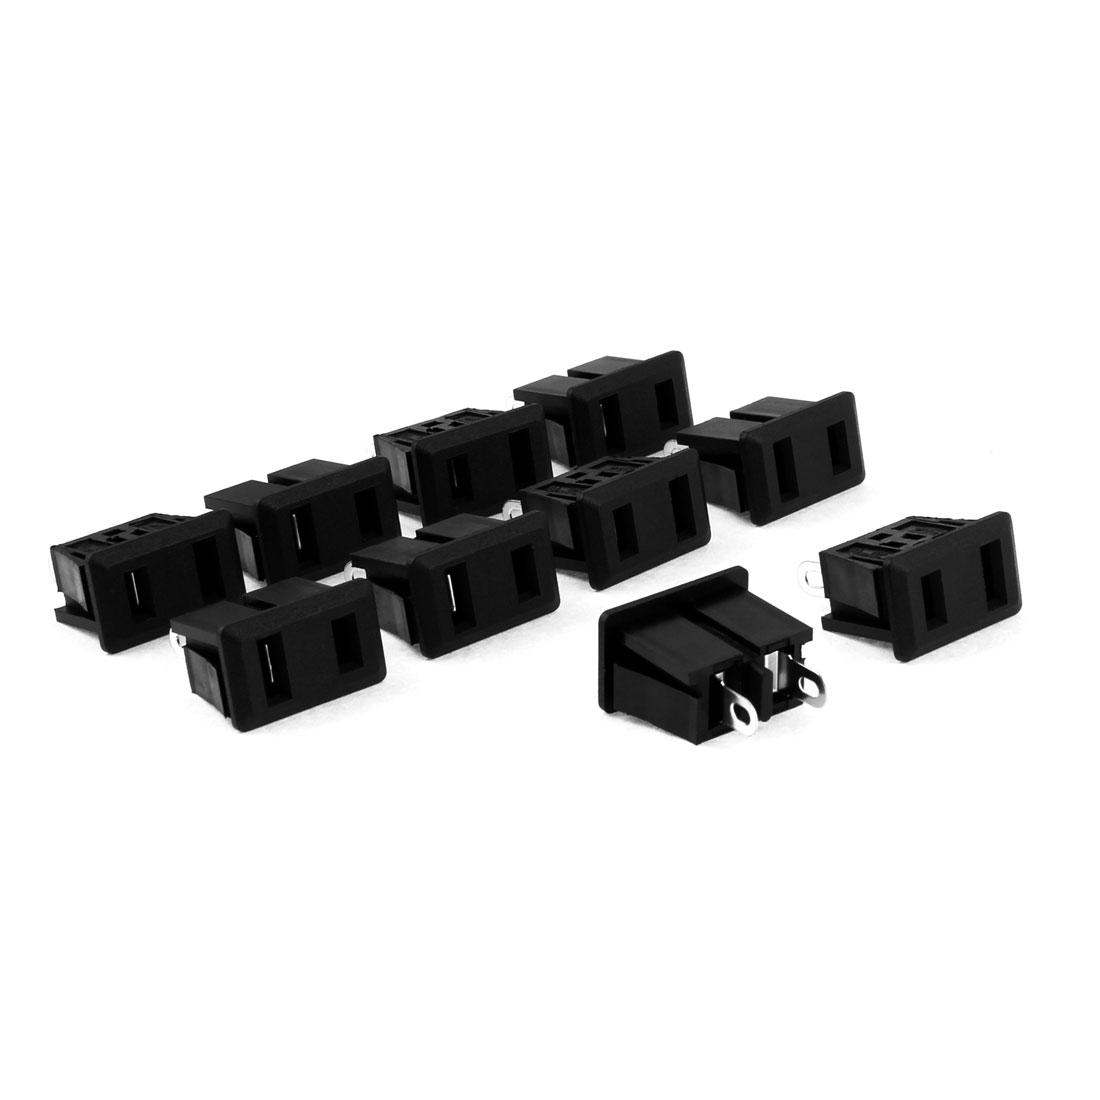 AC 125V 15A Solder Type US Female Socket Jack Power Adapter Converter 10 Pcs